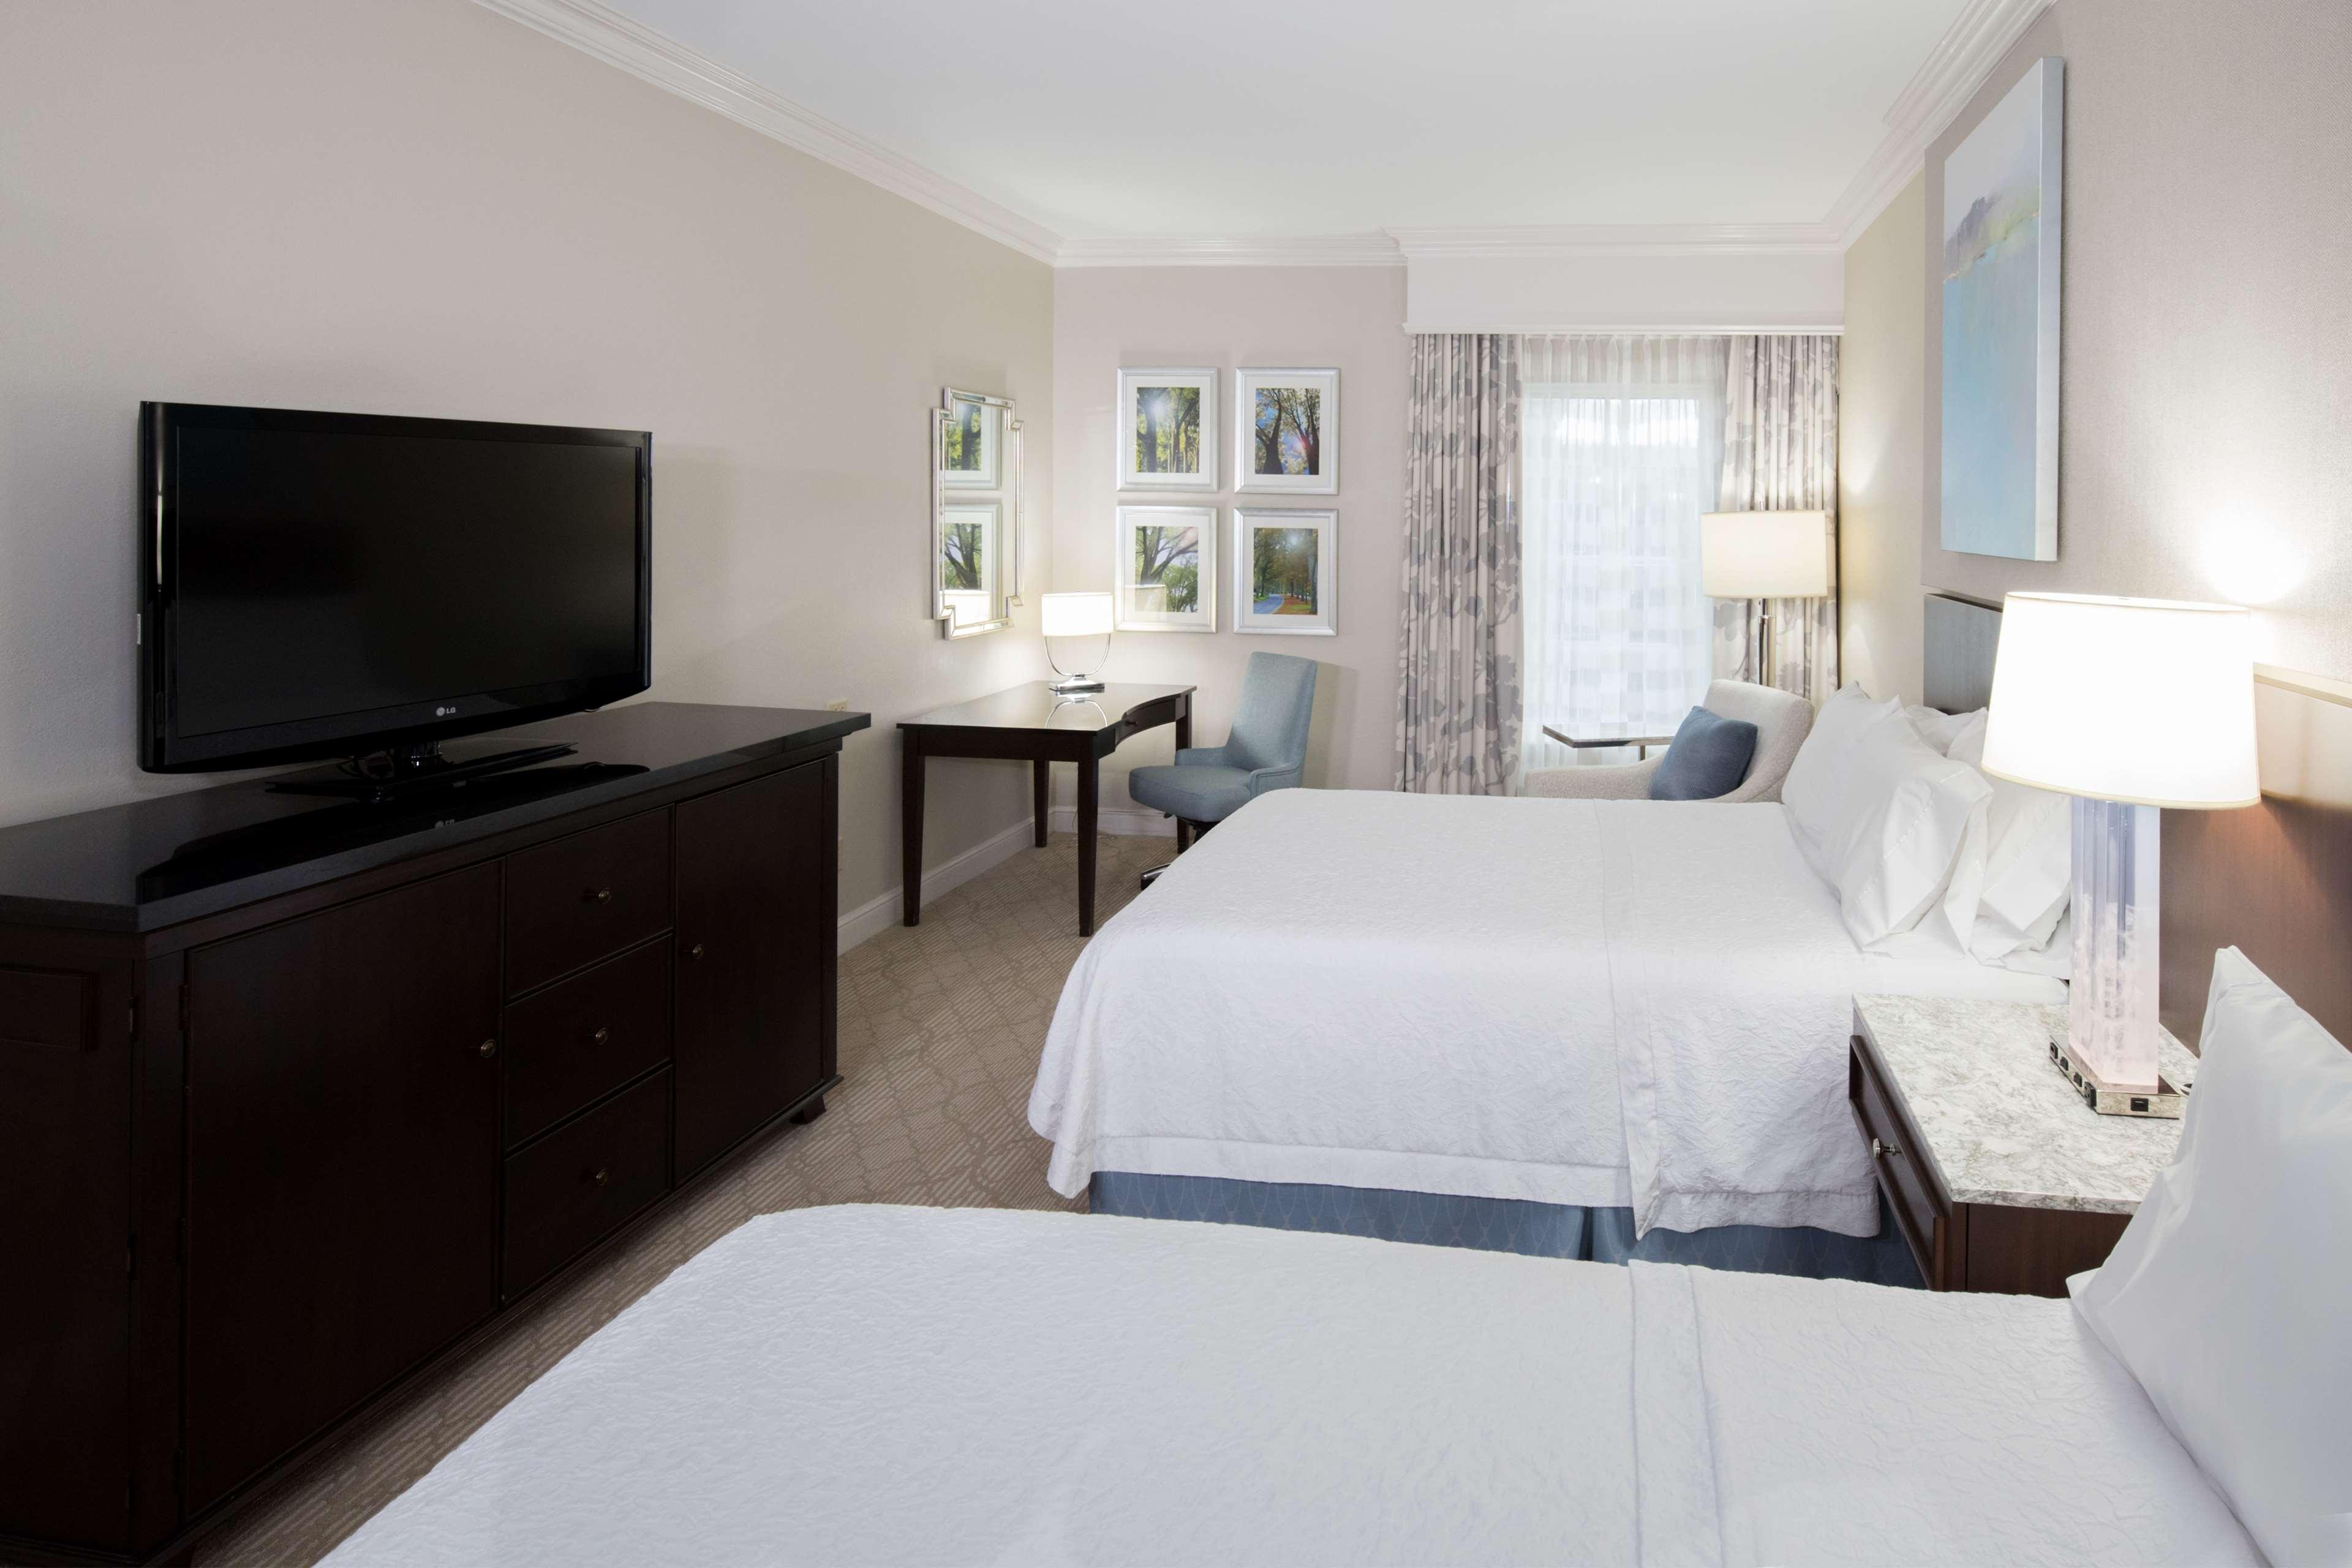 Hampton Inn & Suites Charlotte/South Park at Phillips Place image 16